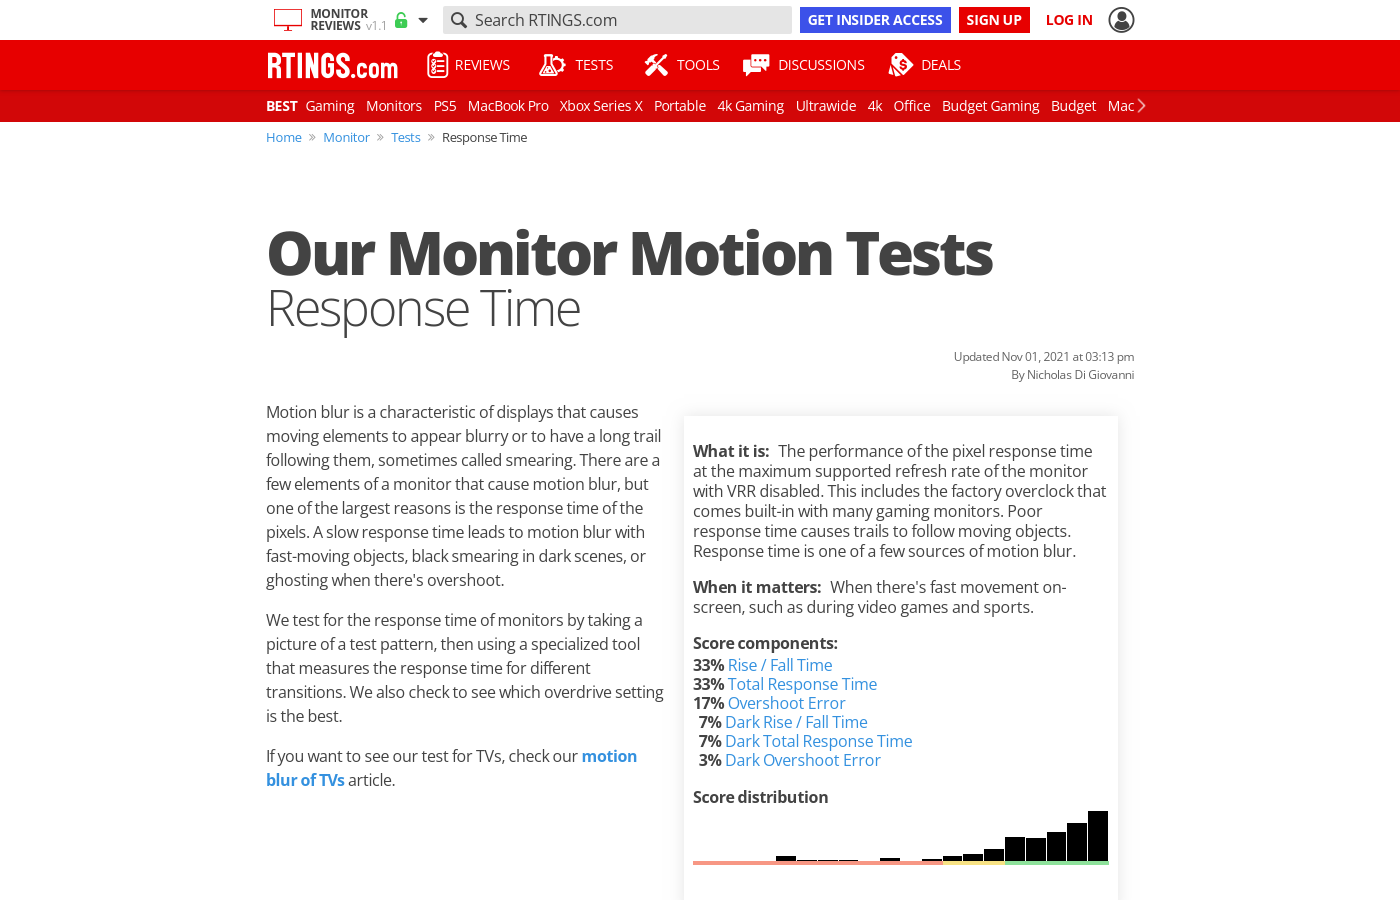 Response Time Of Monitors